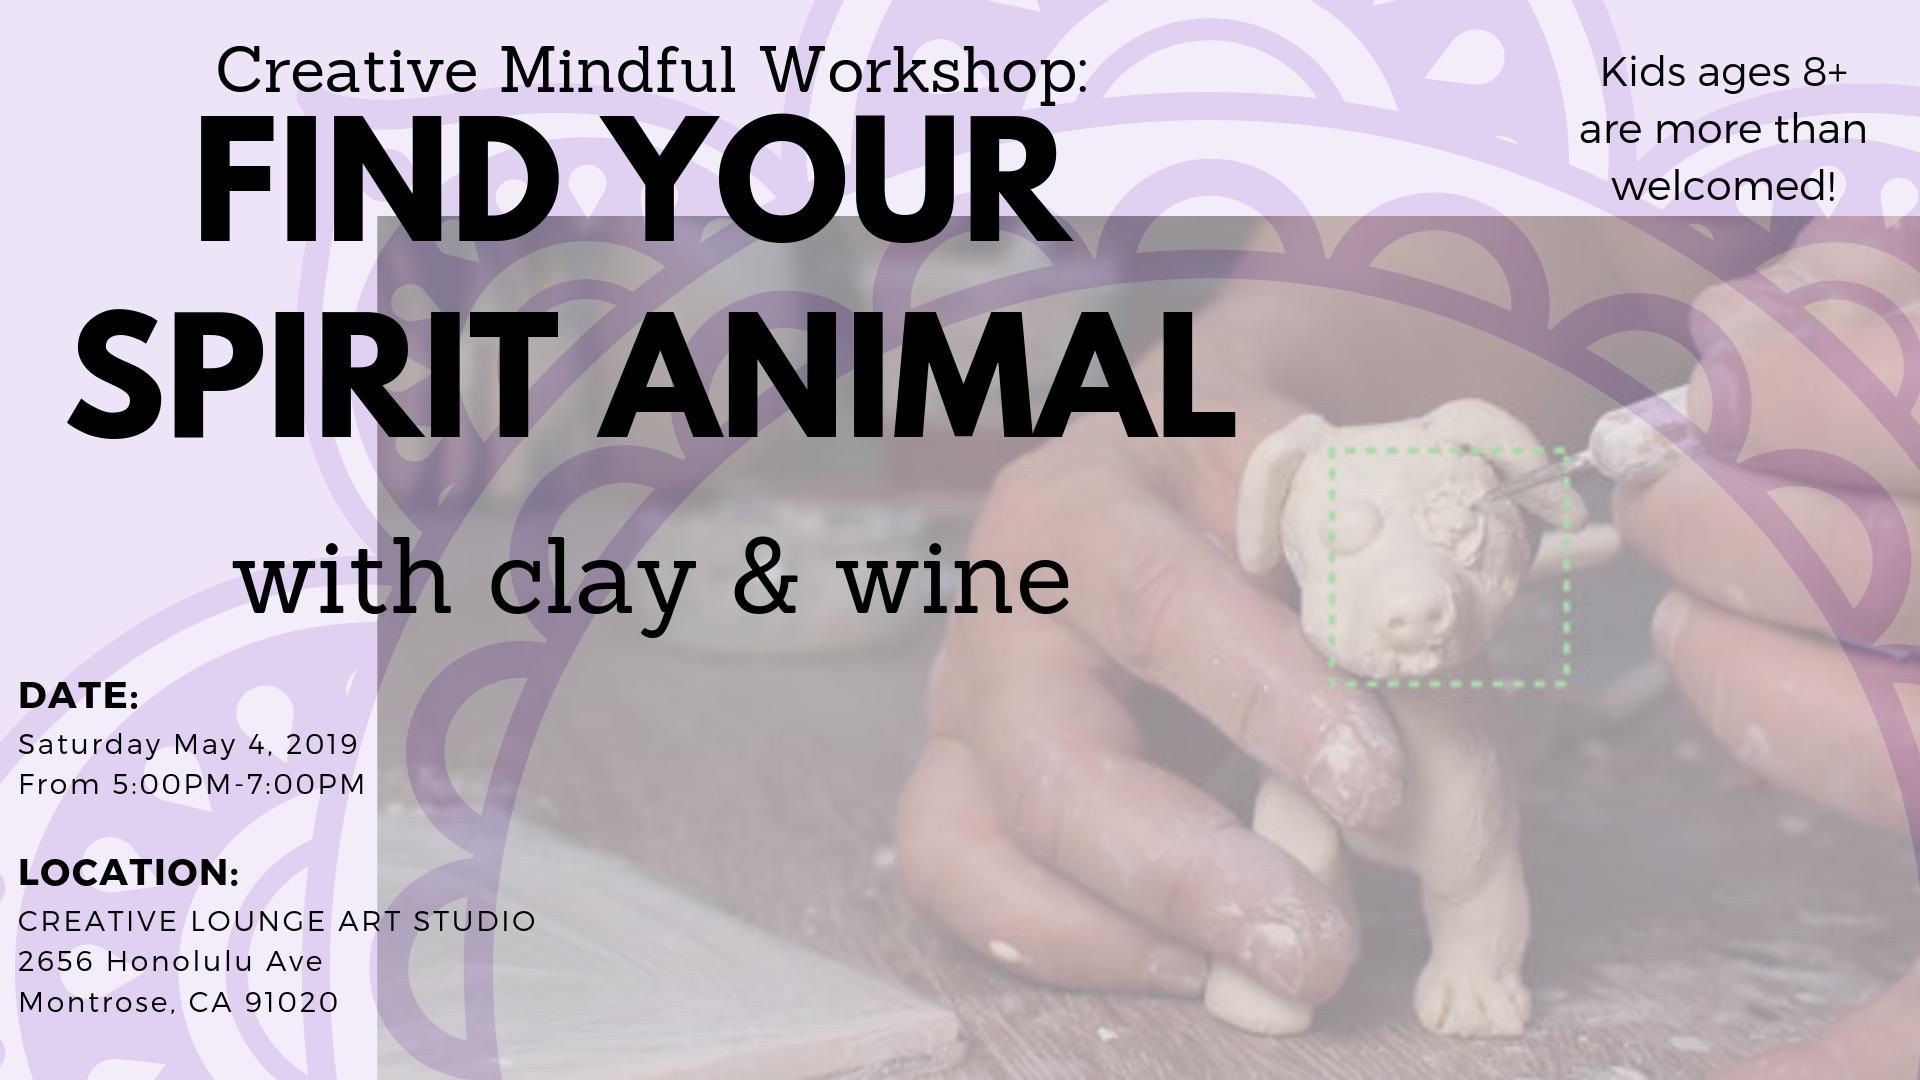 Creative Mindful Workshop: Clay Spirit Animal